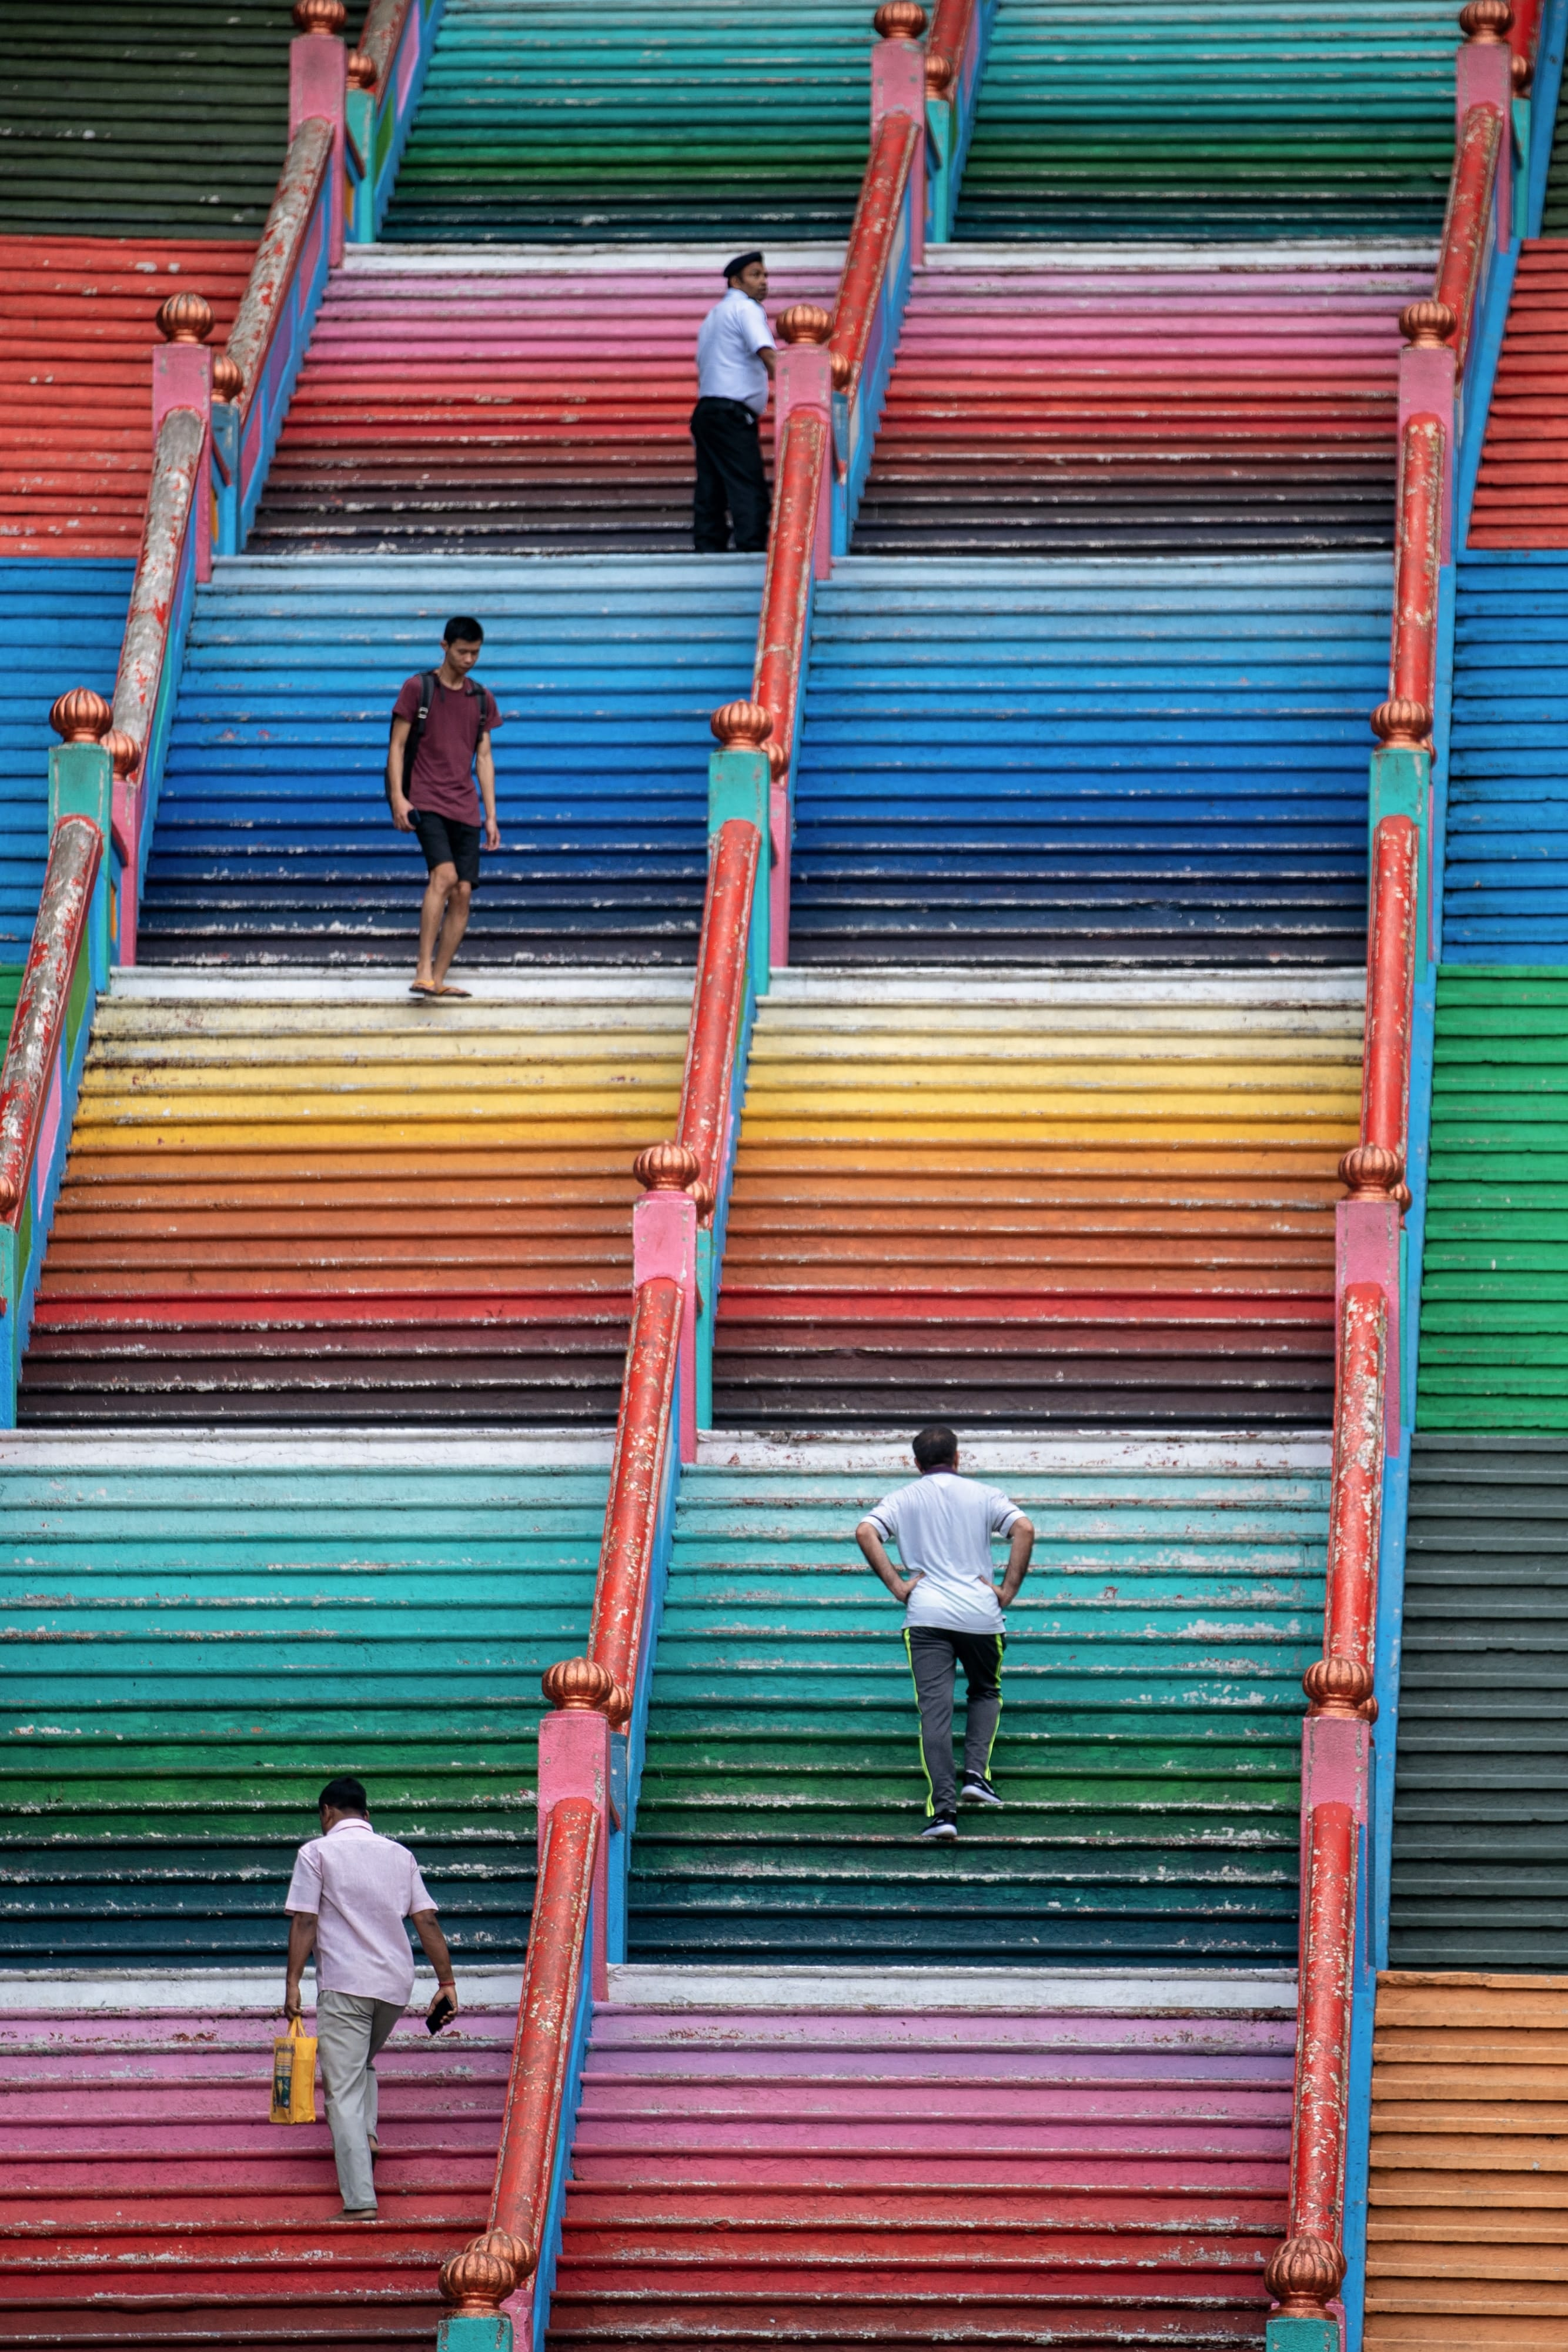 rainbow-color-staircase-kuala-lumpur-malaysia